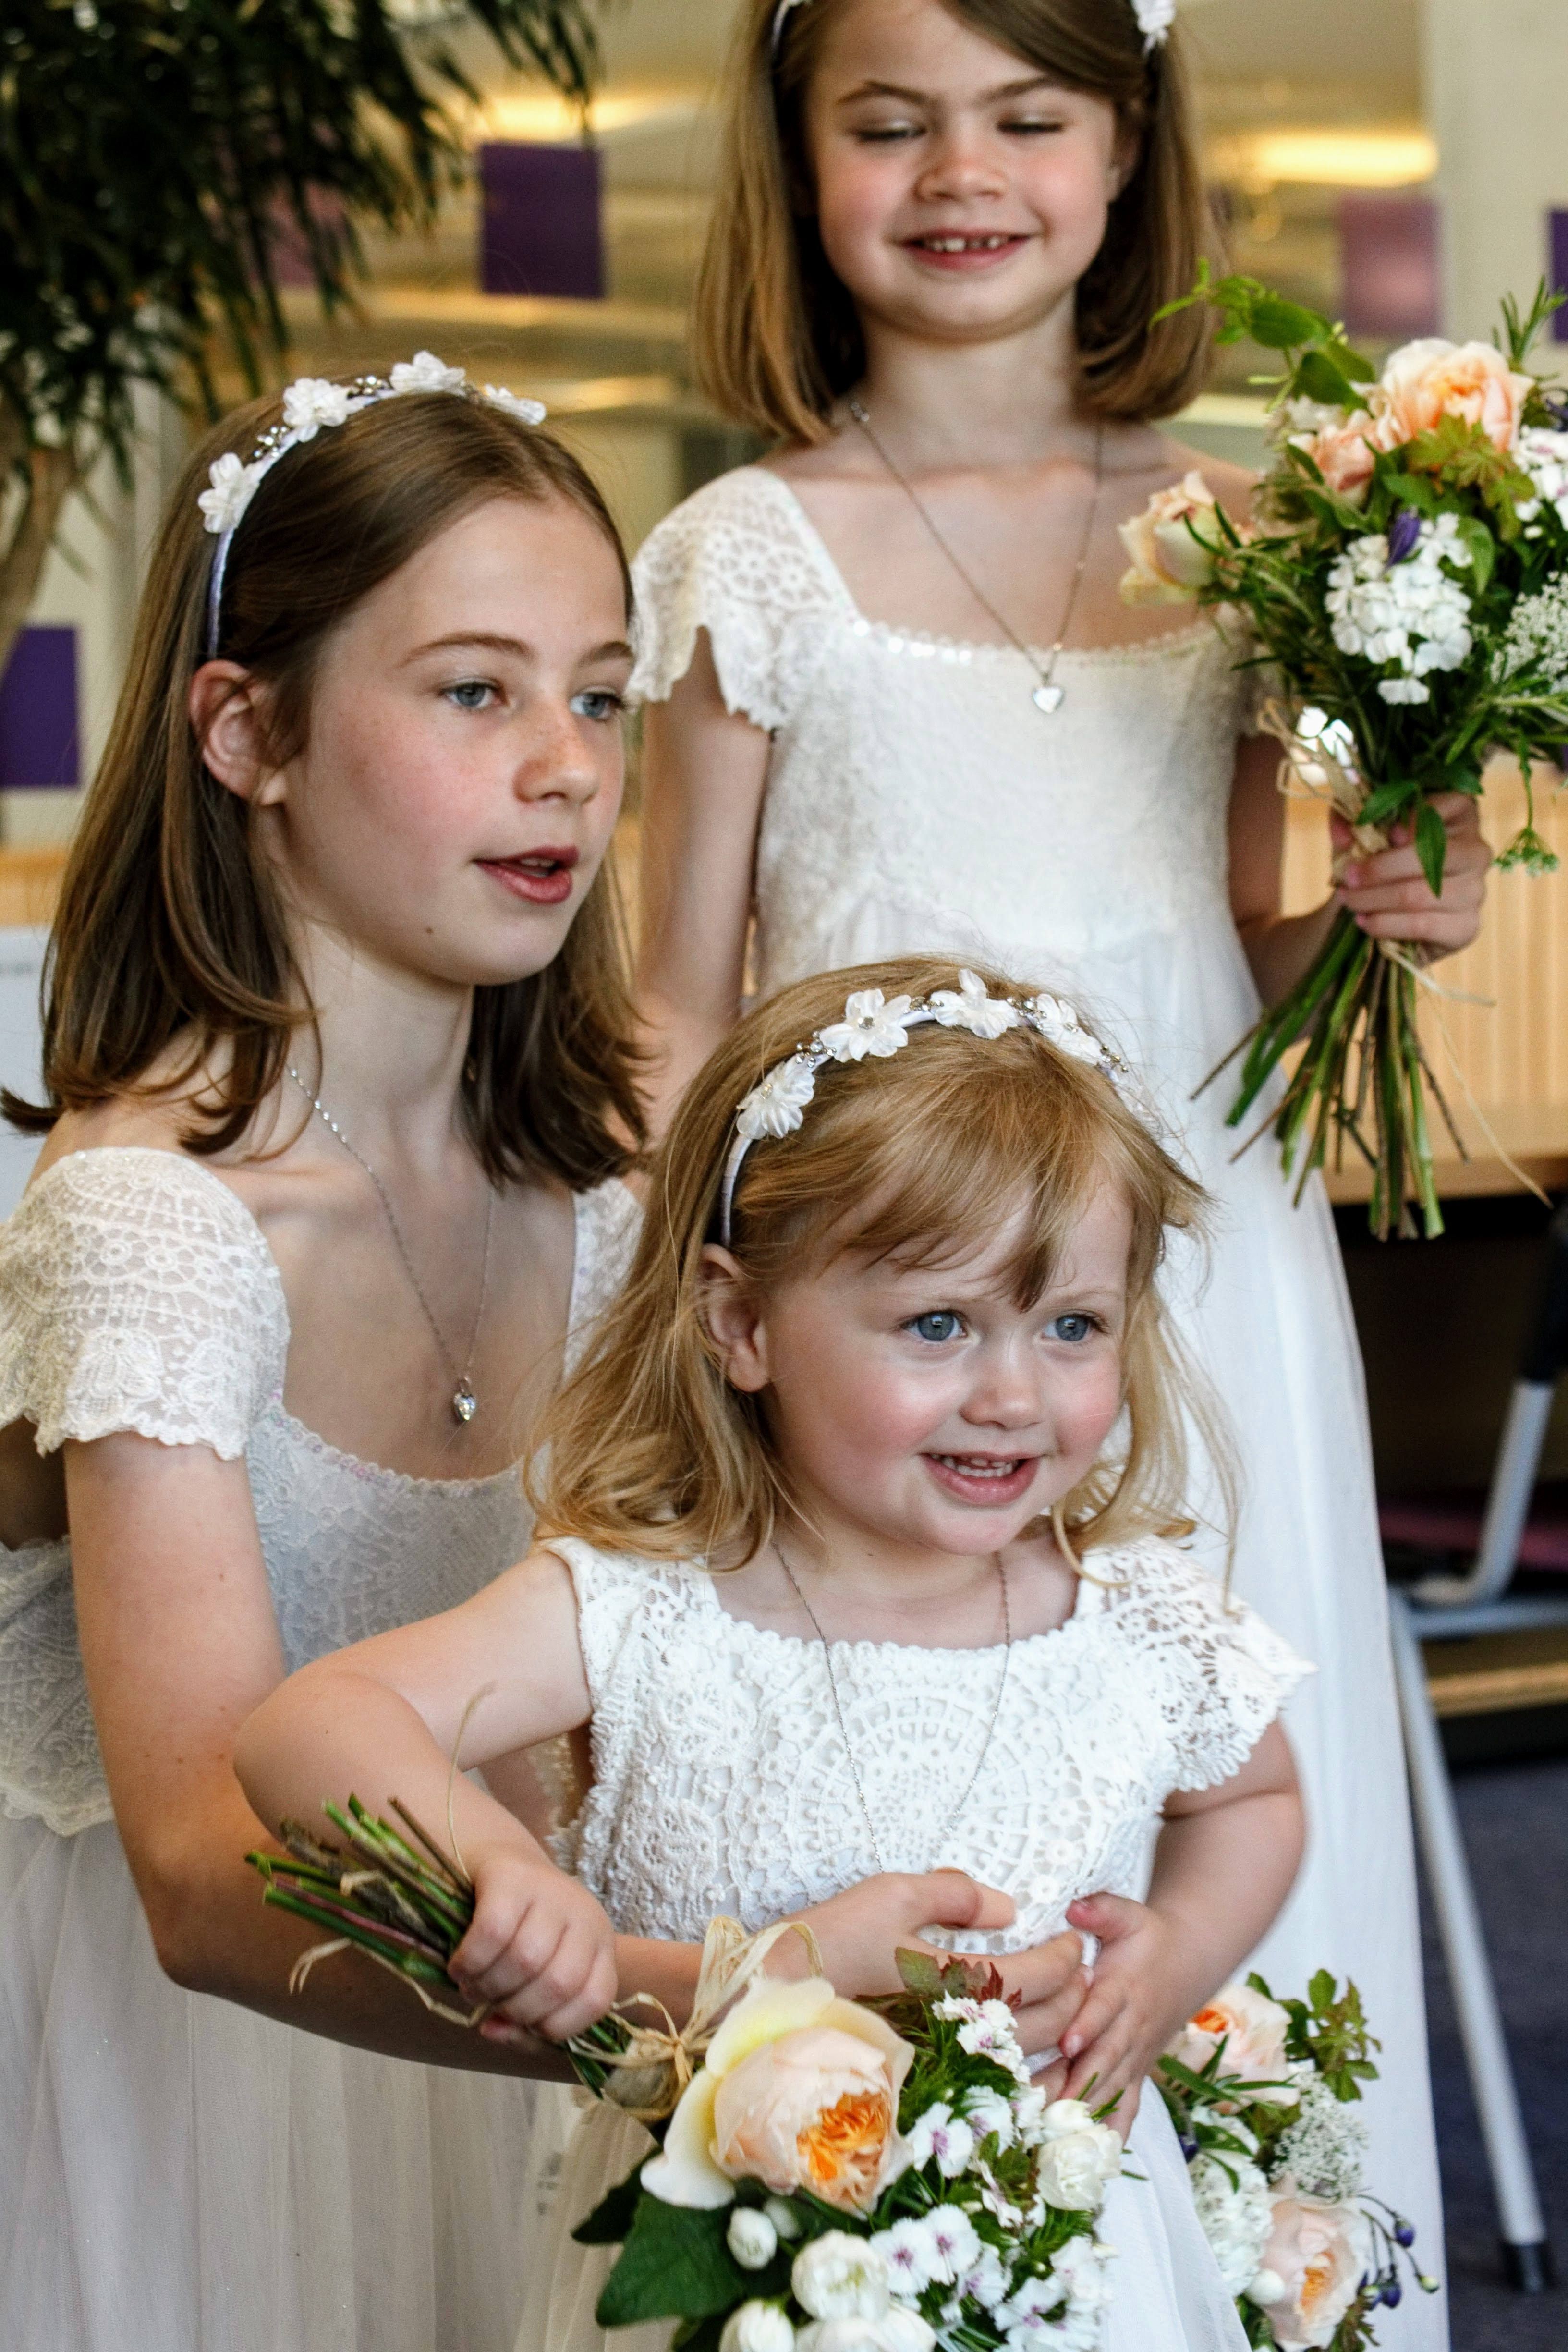 Bridesmaids & Flower Girl Bouquets